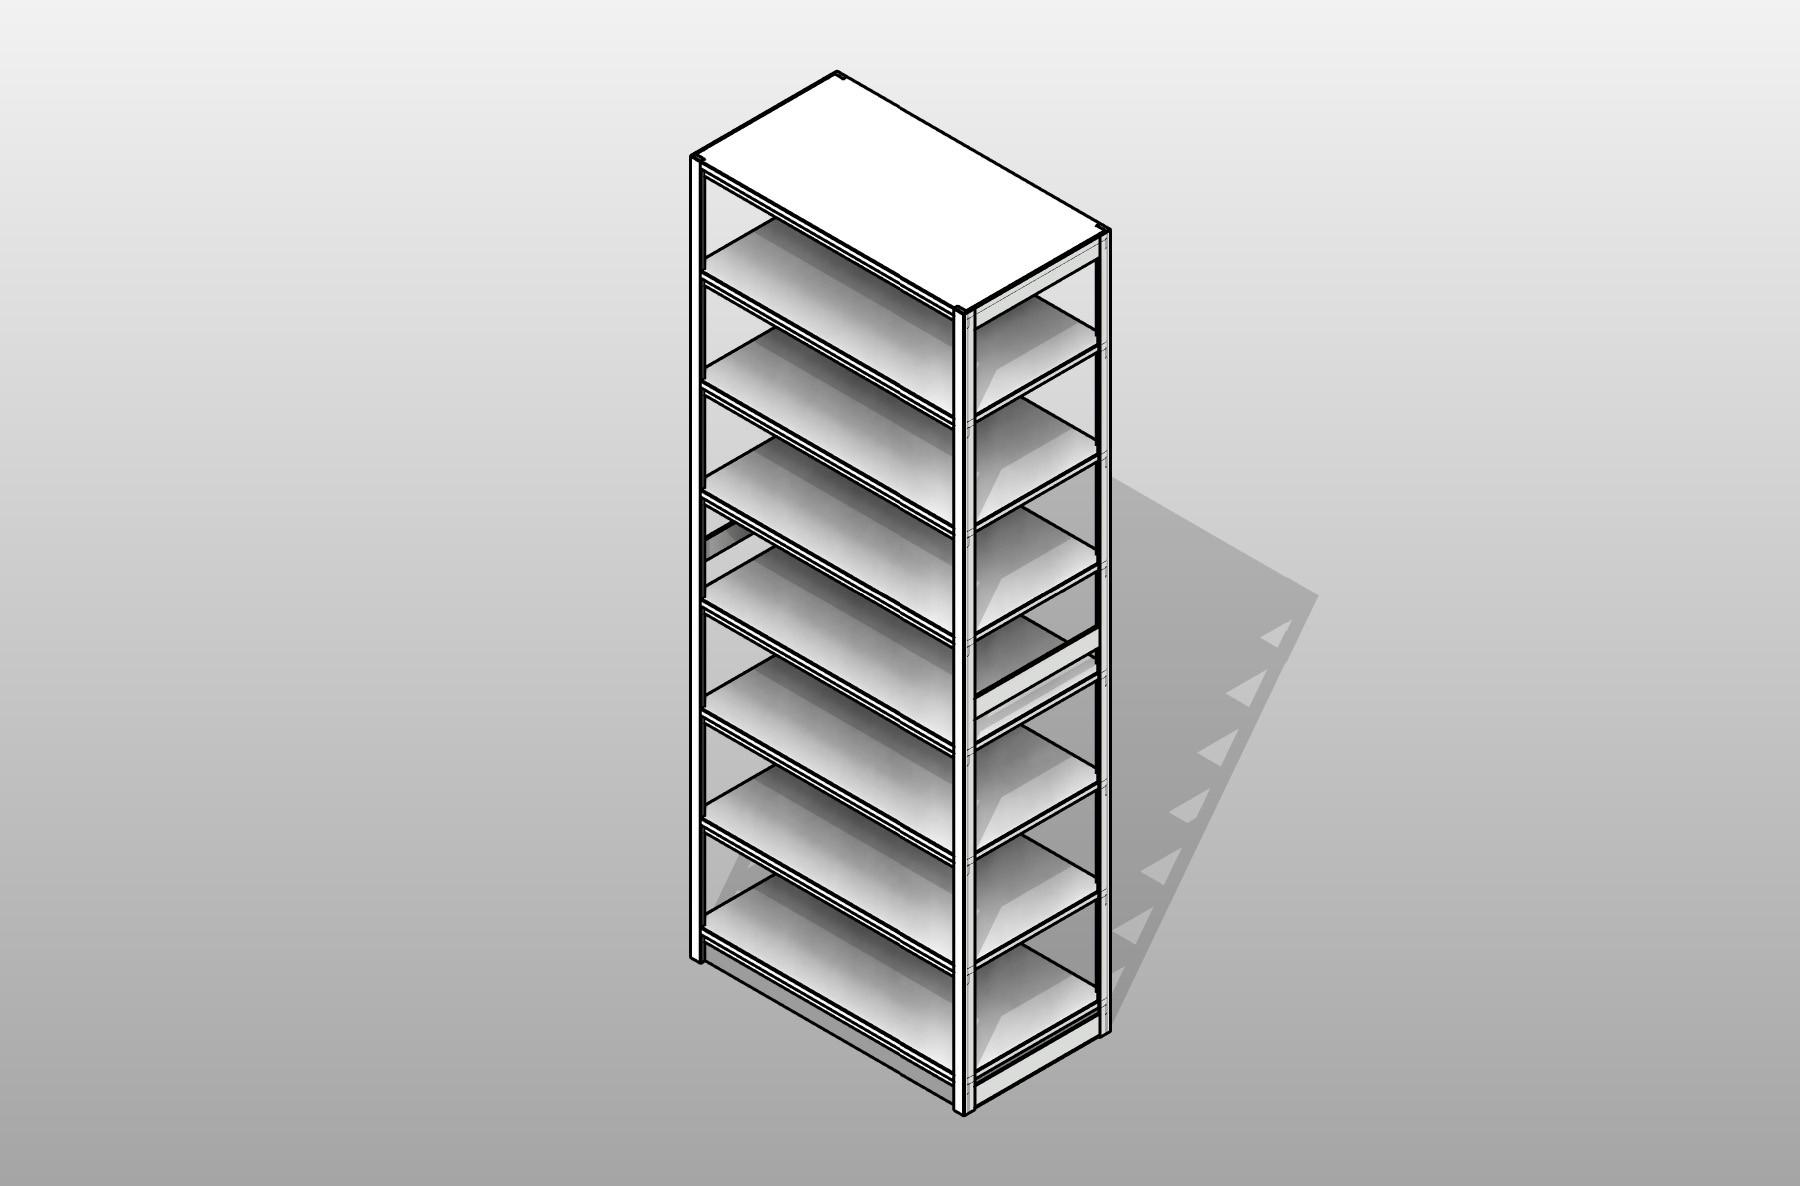 Box Archive 4 Post Shelving